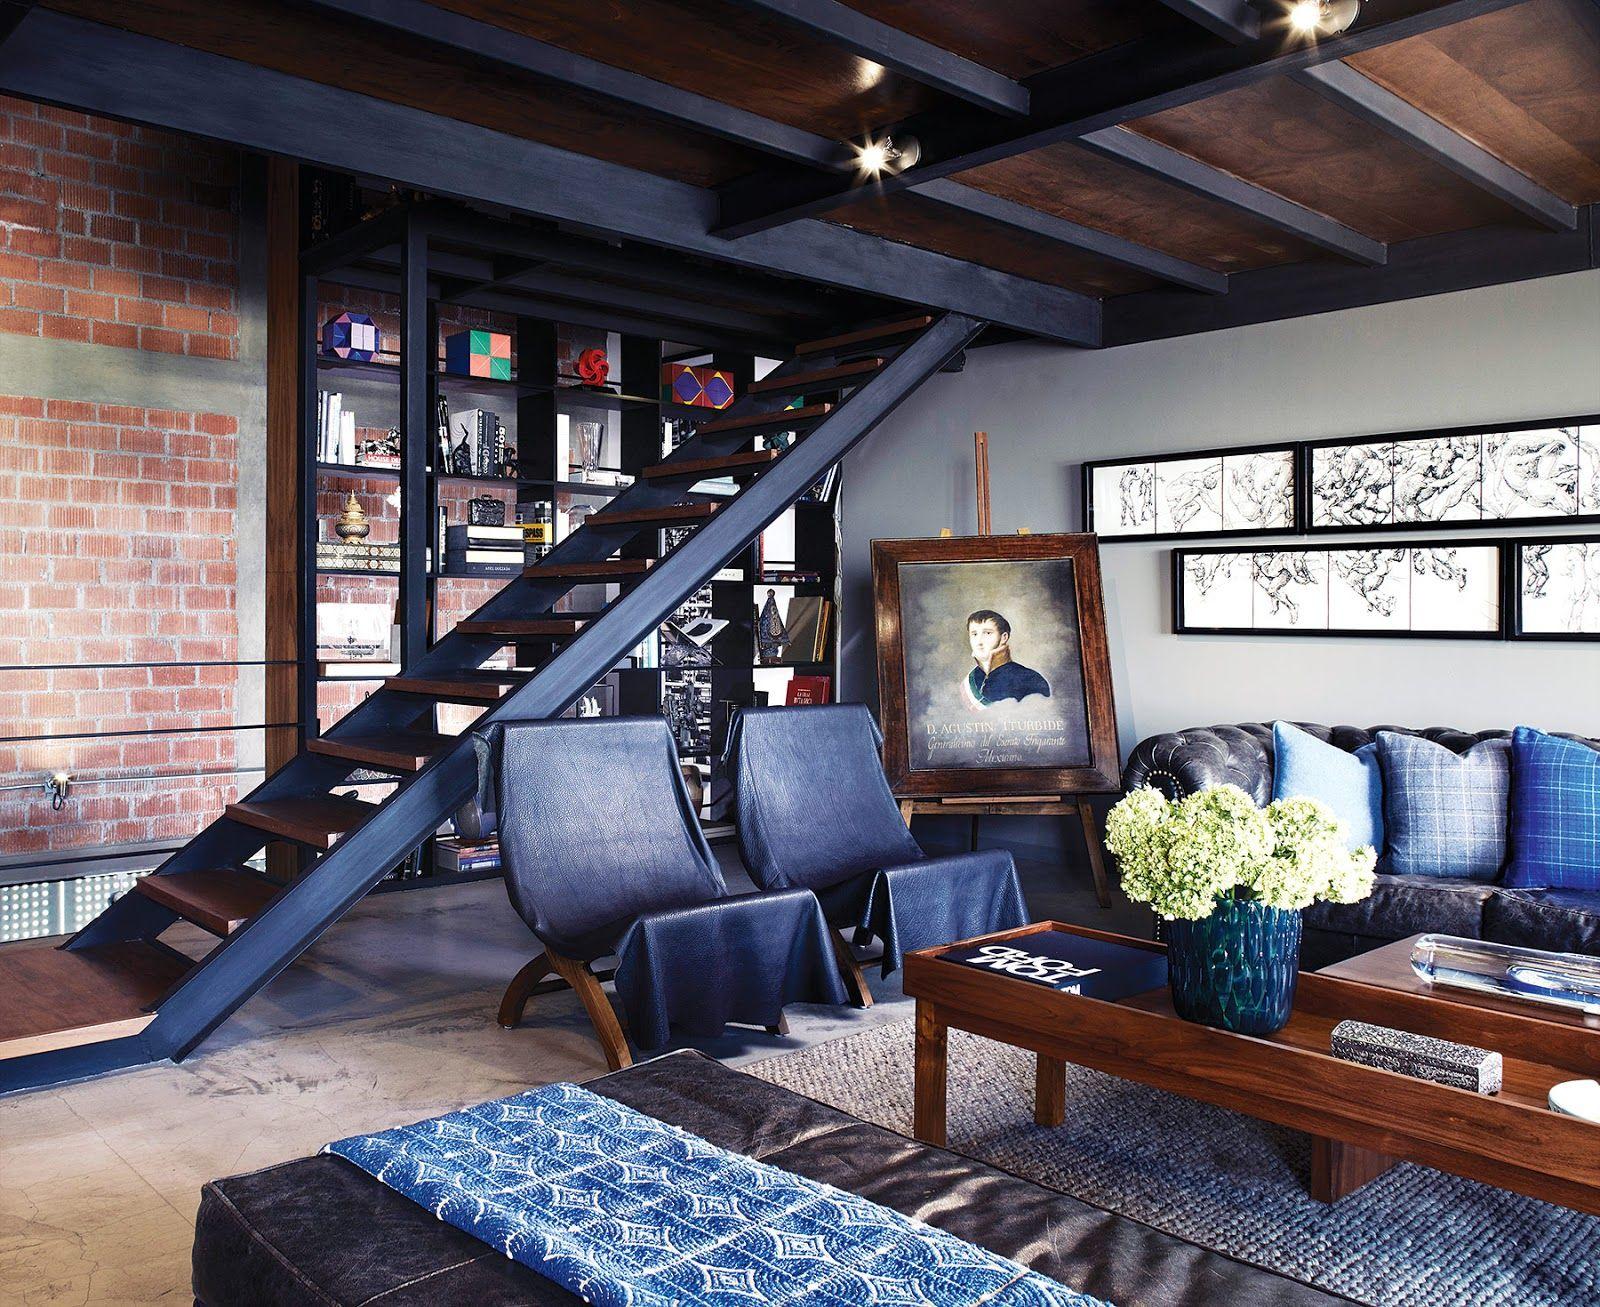 Arredamento Loft ~ Arredamento industriale blog arredamento loft pinterest lofts